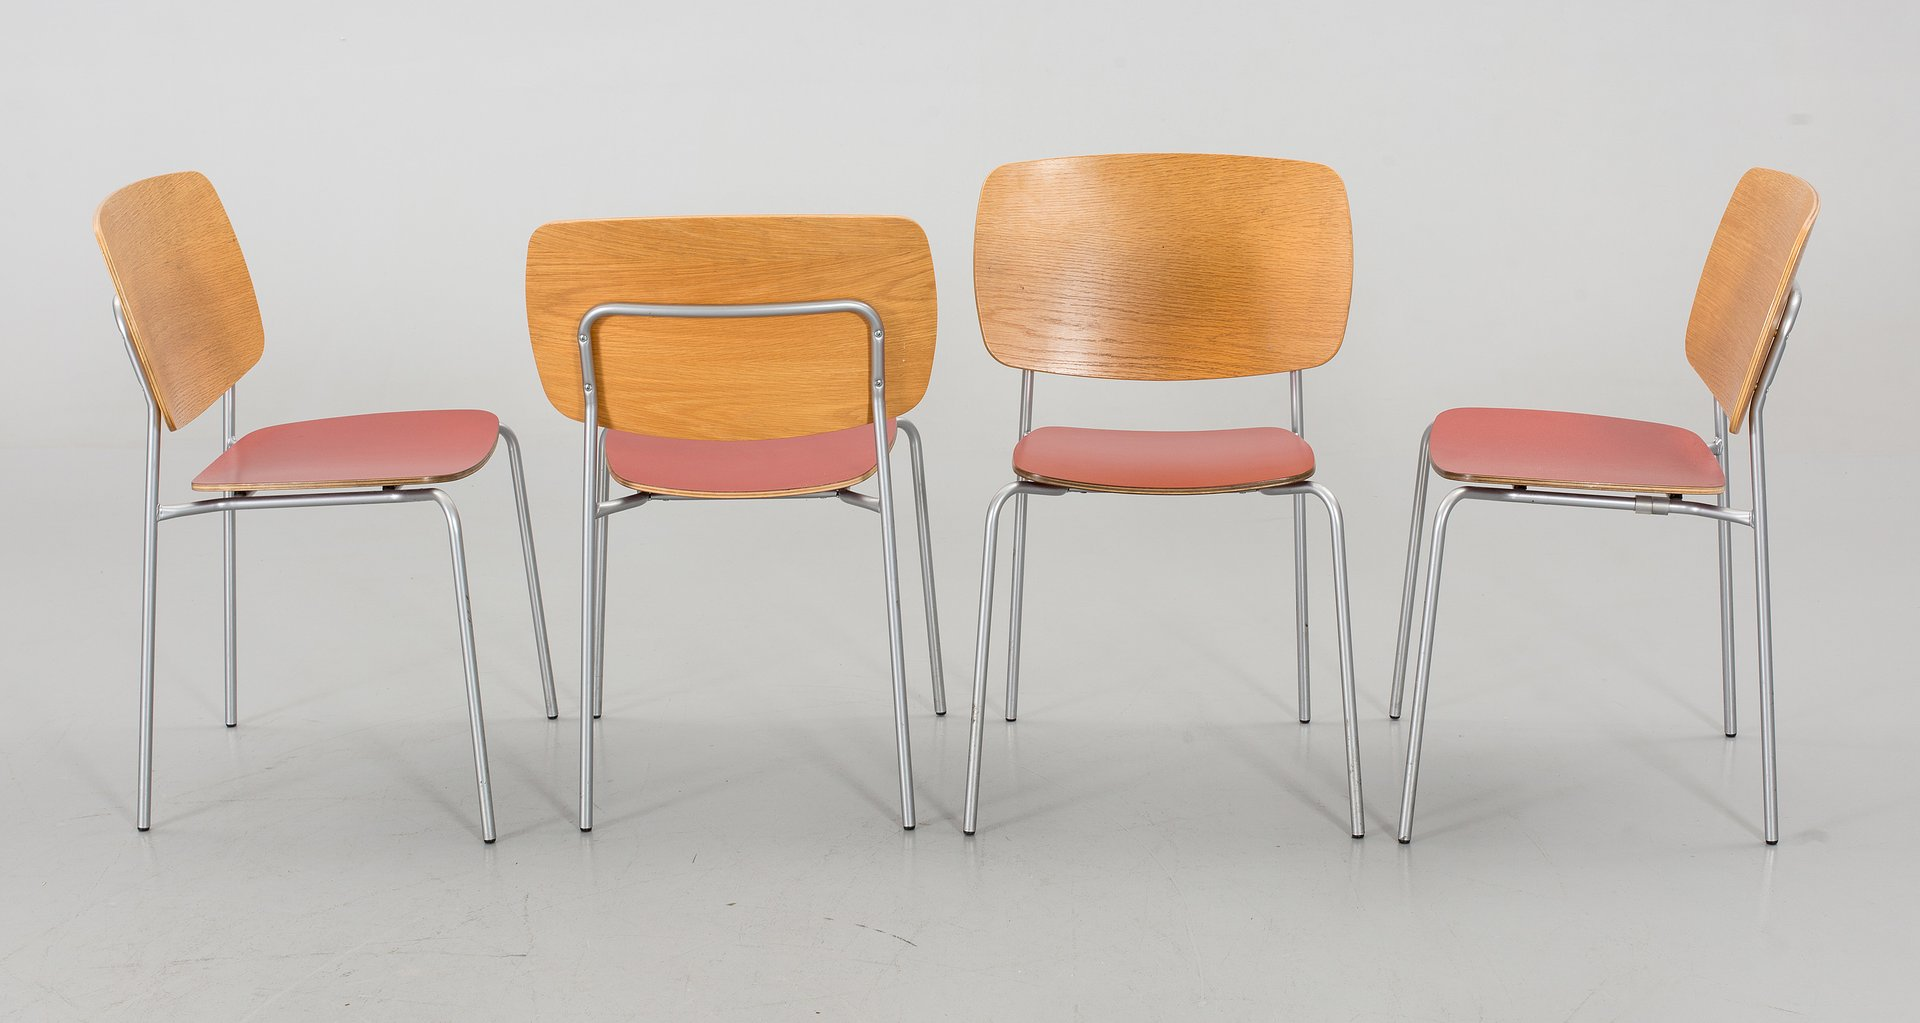 skandinavische moderne st hle von jonas lindvall f r. Black Bedroom Furniture Sets. Home Design Ideas